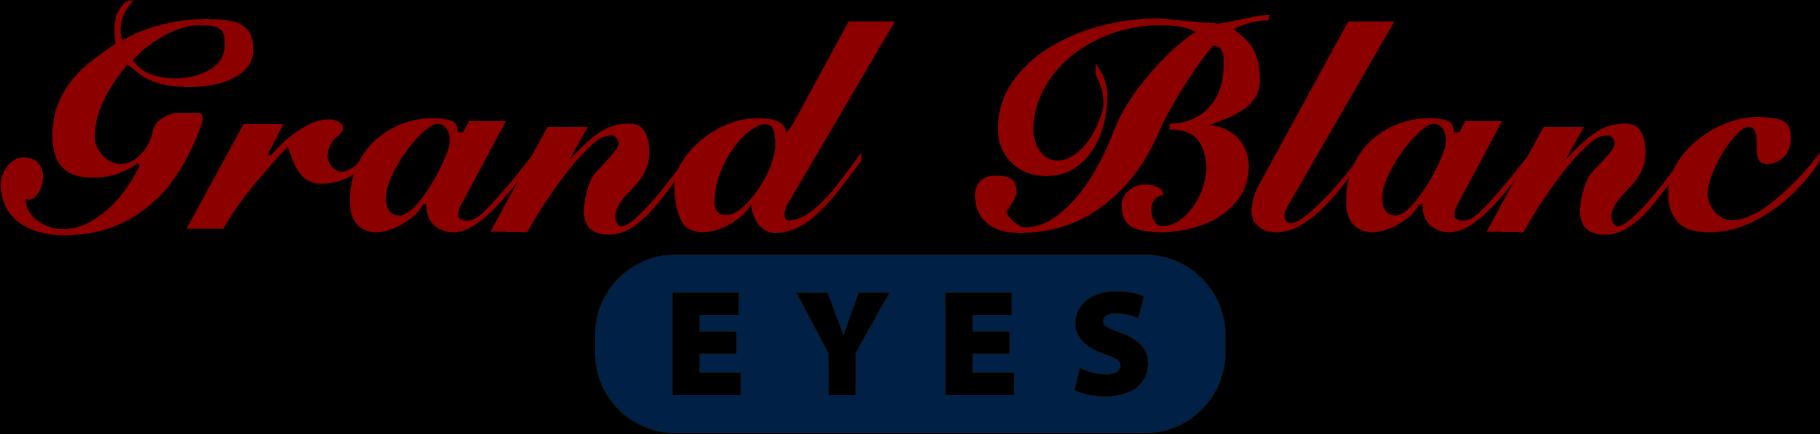 Grand Blanc Eyes